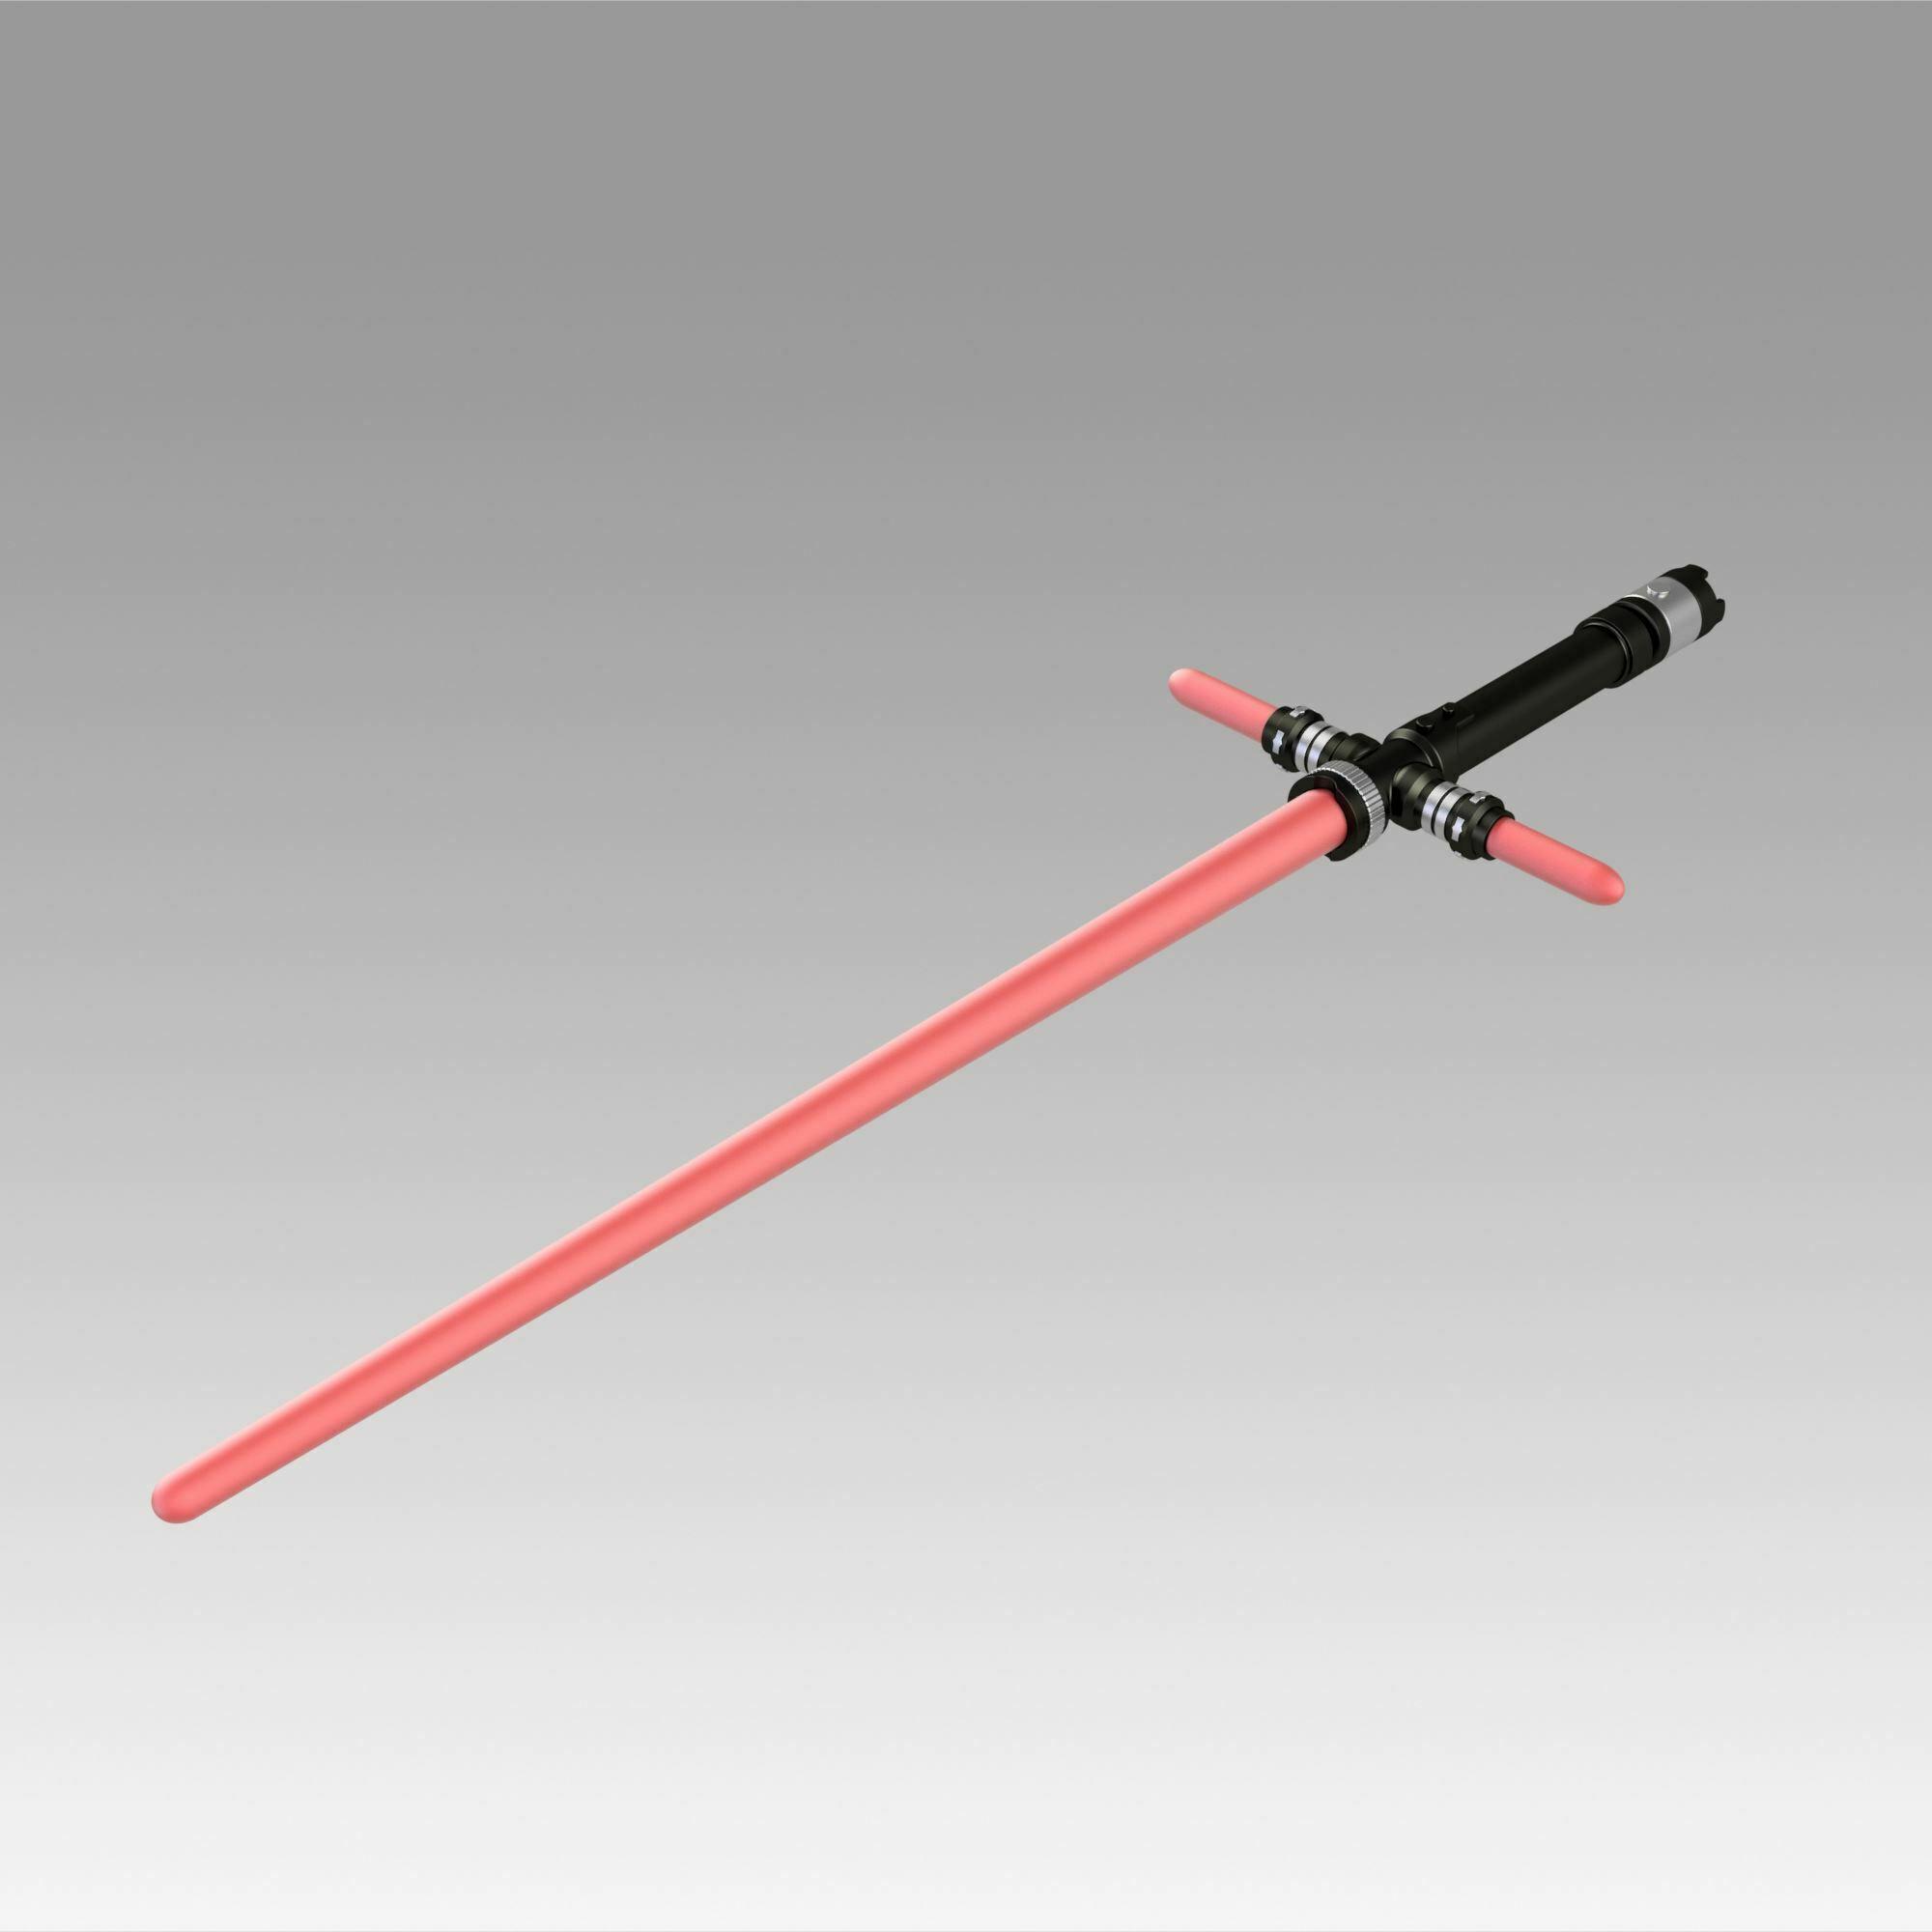 6.jpg Download OBJ file Star Wars VII The Force Awakens Kylo Ren Sword Cosplay Prop • 3D printer object, Blackeveryday